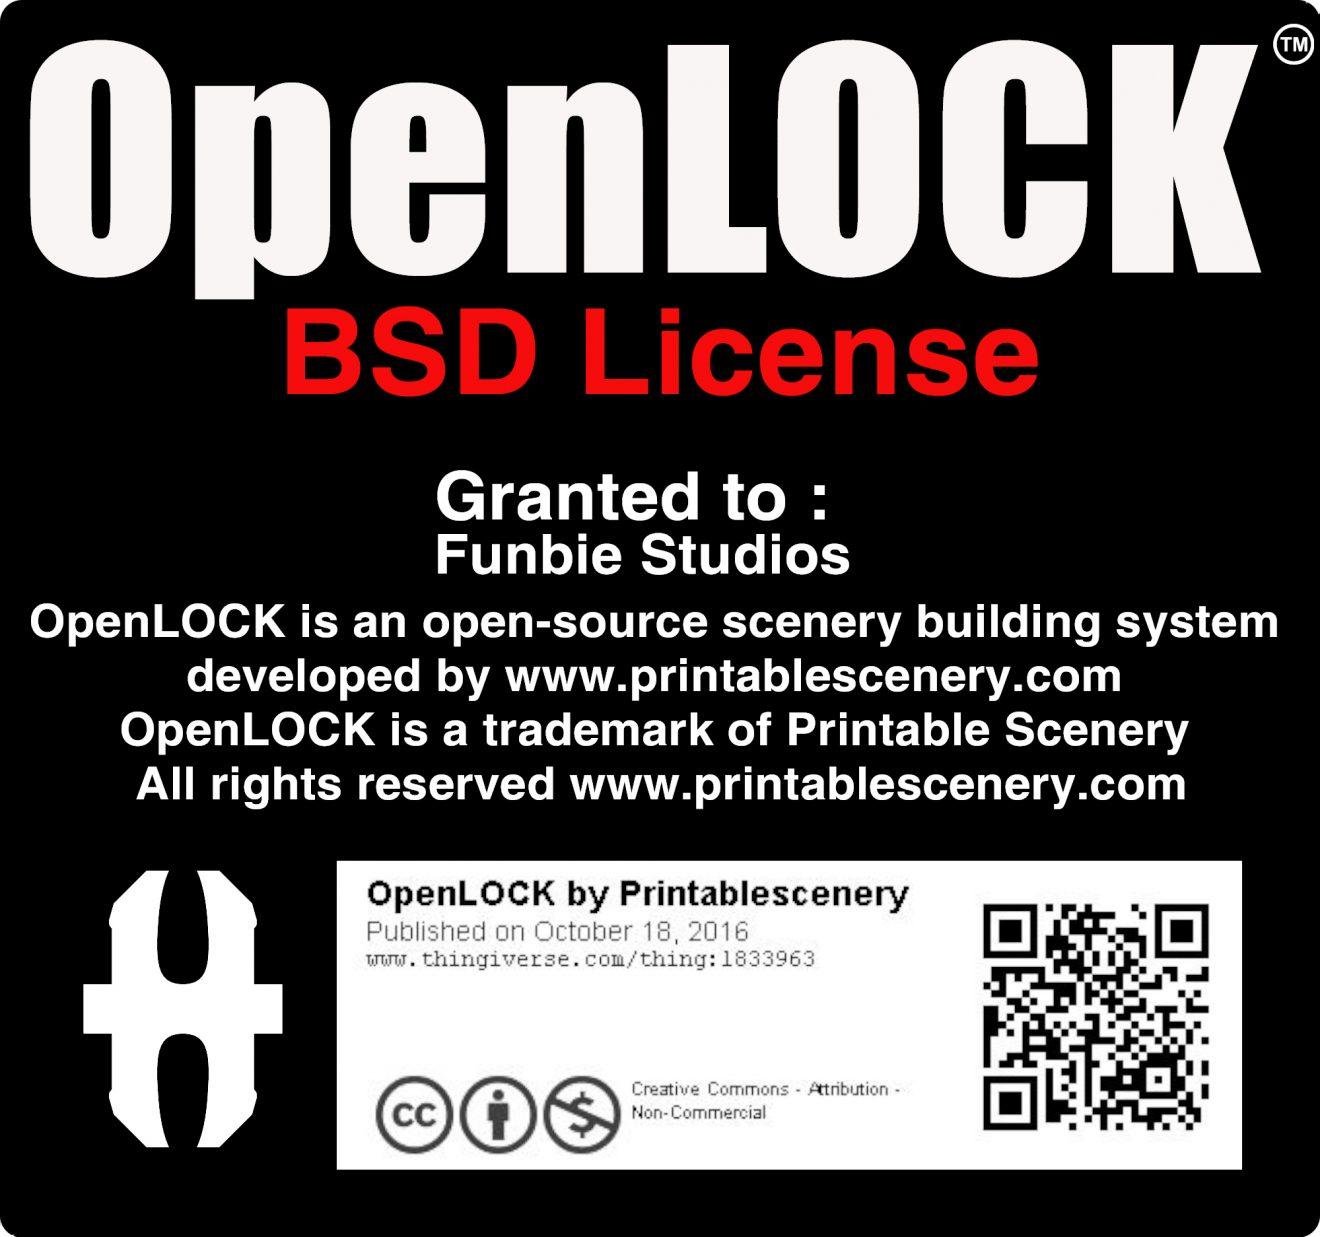 OpenLOCK License - Funbie Studios